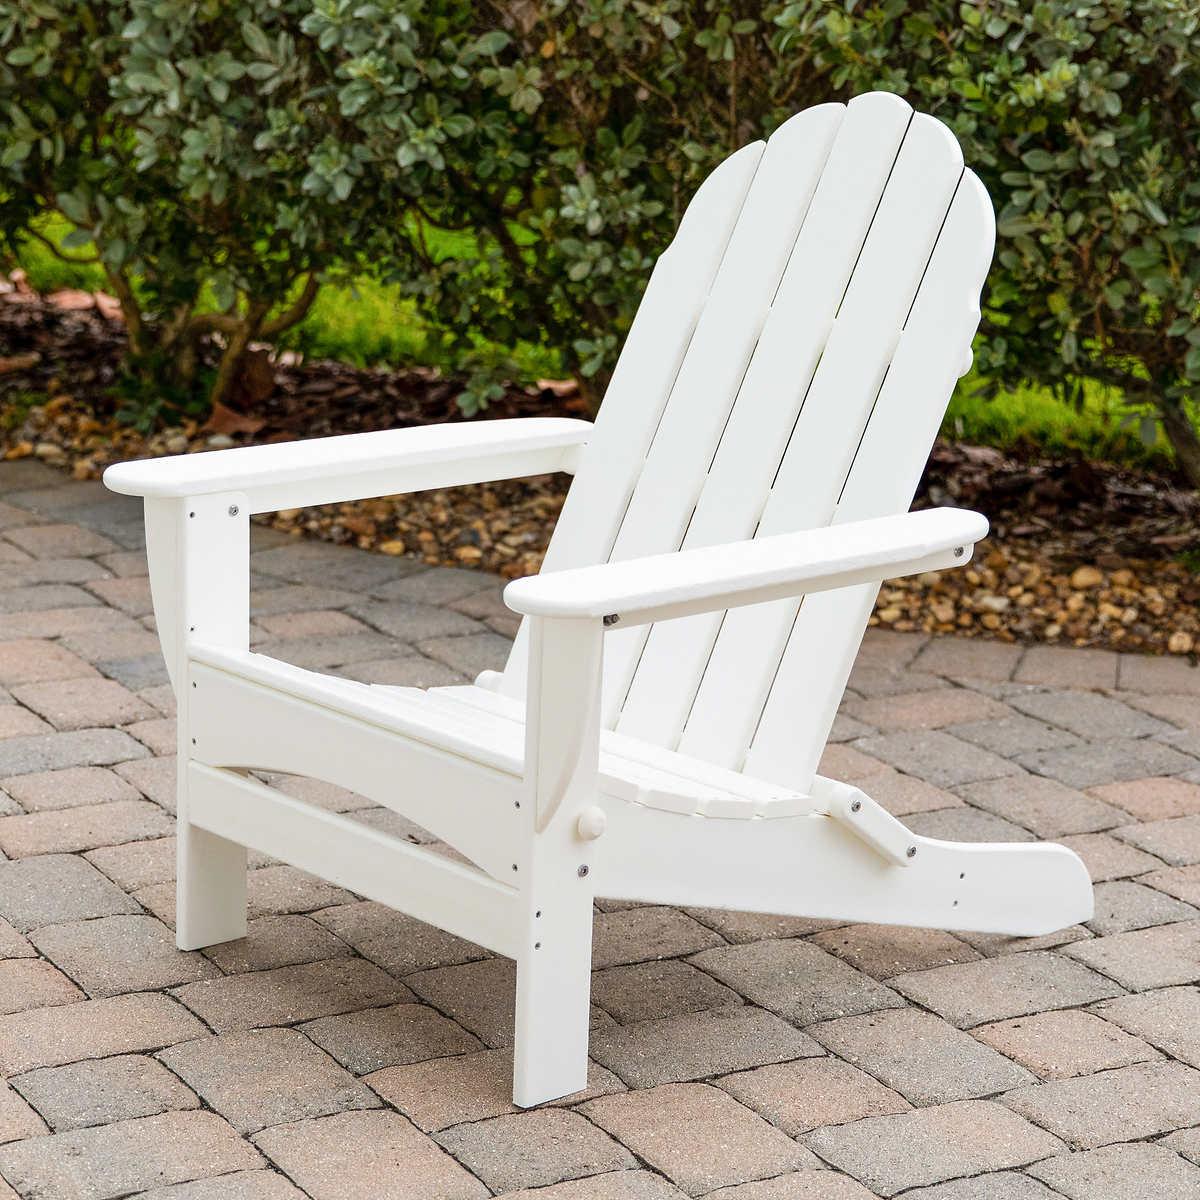 Long Beach Folding Adirondack Chair